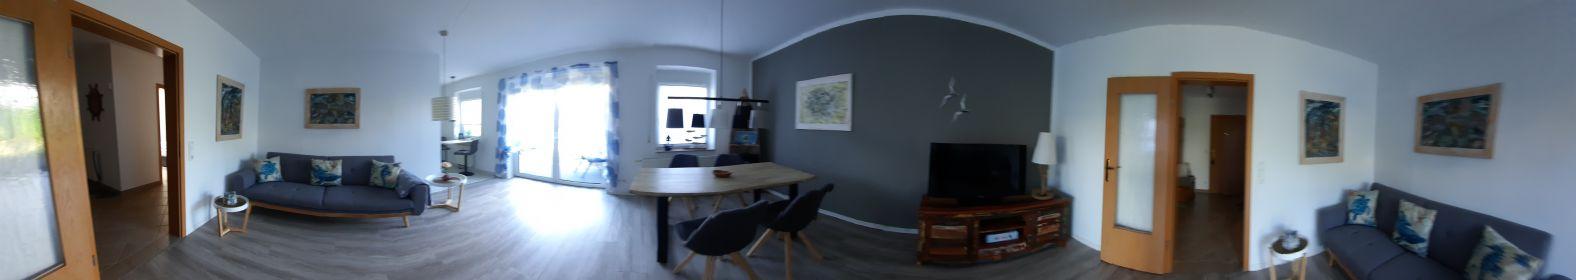 ferienwohnung-ilona-panorama